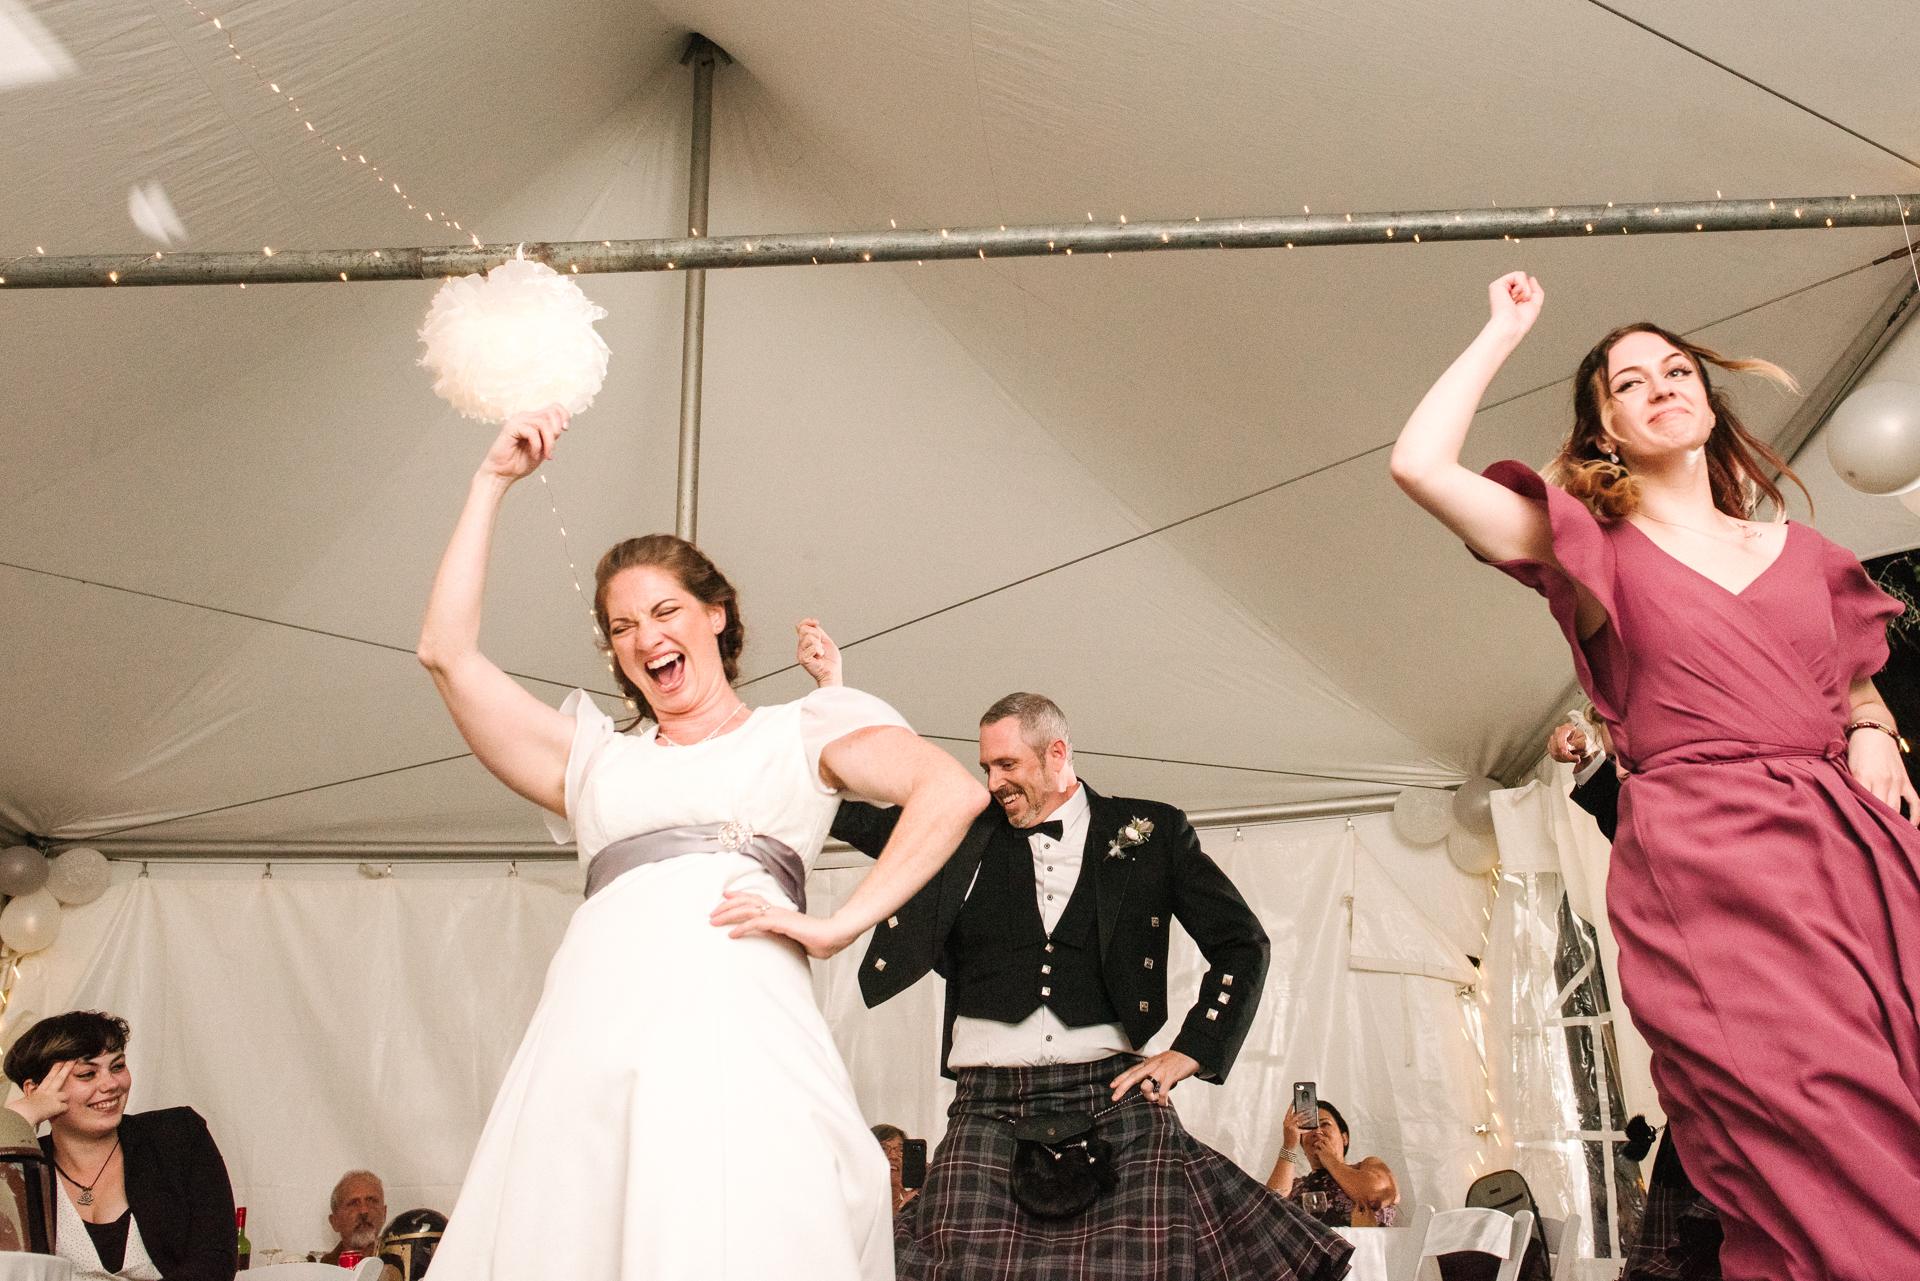 Kanata, Ottawa, Backyard Wedding Photo | Part of the first dance included a group dance